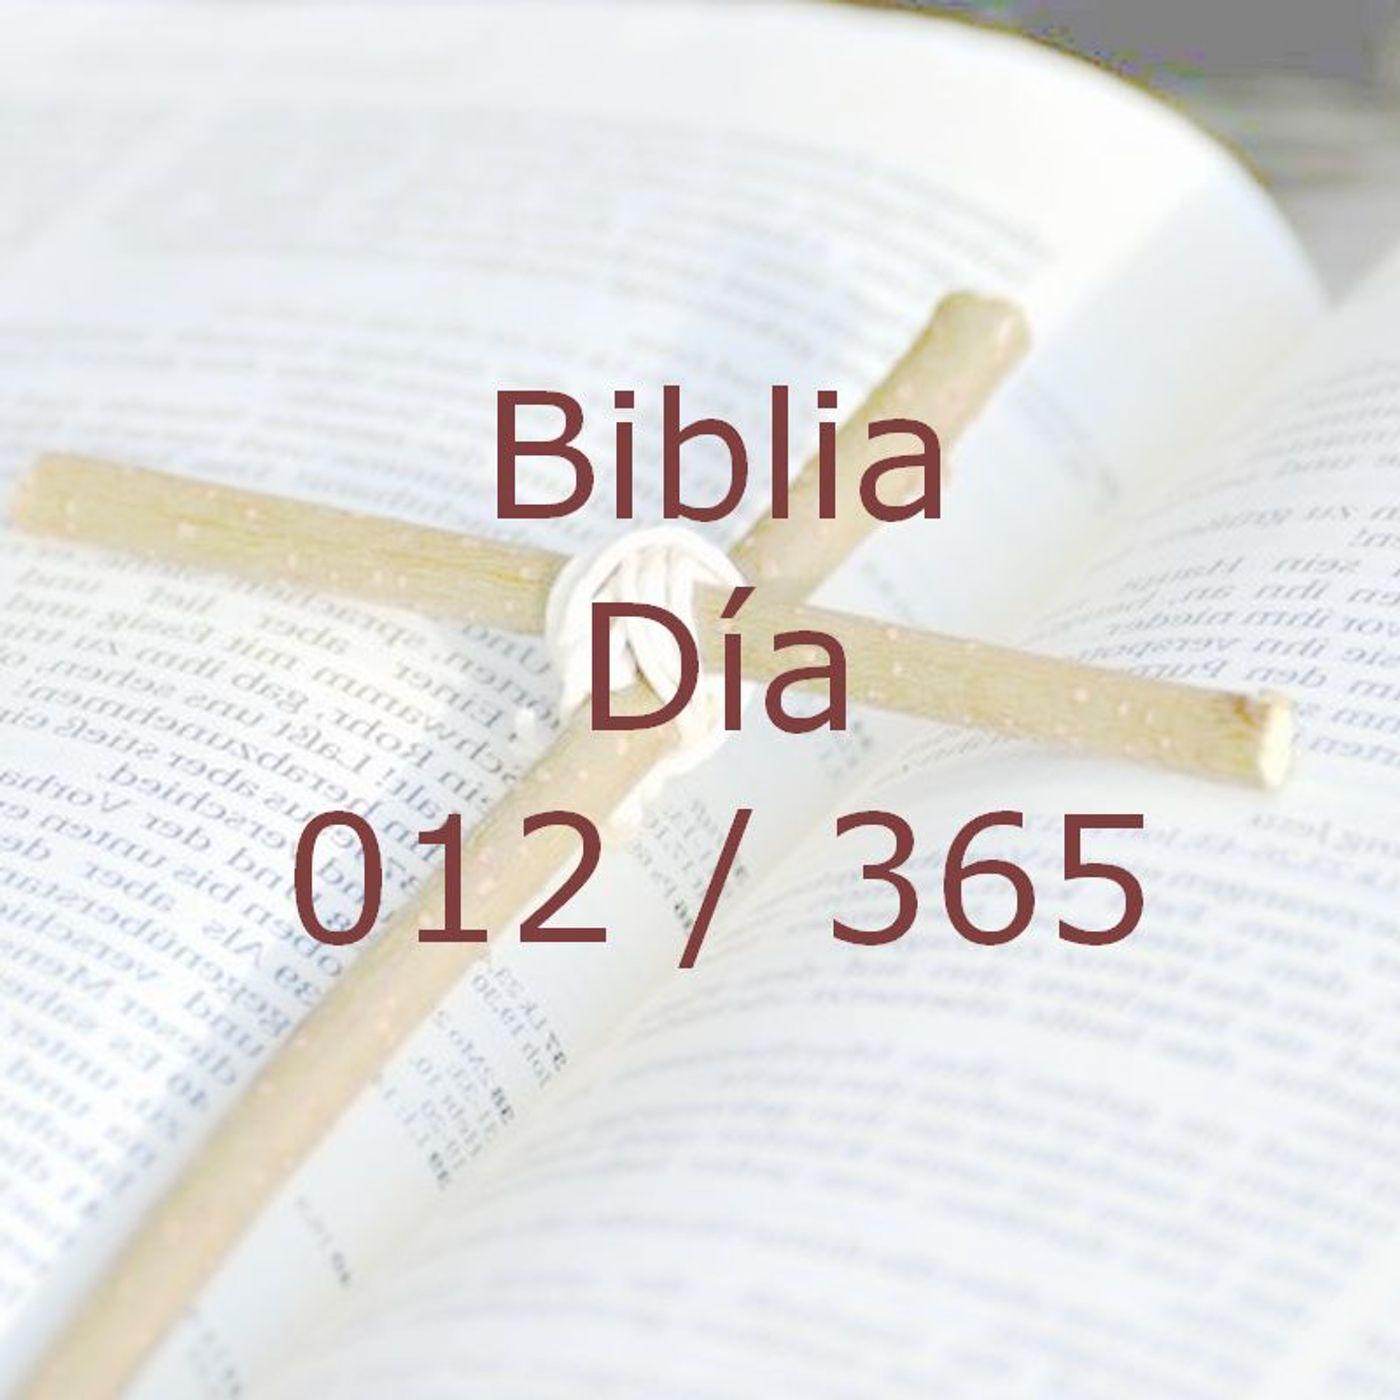 365 dias para la Biblia - Dia 012